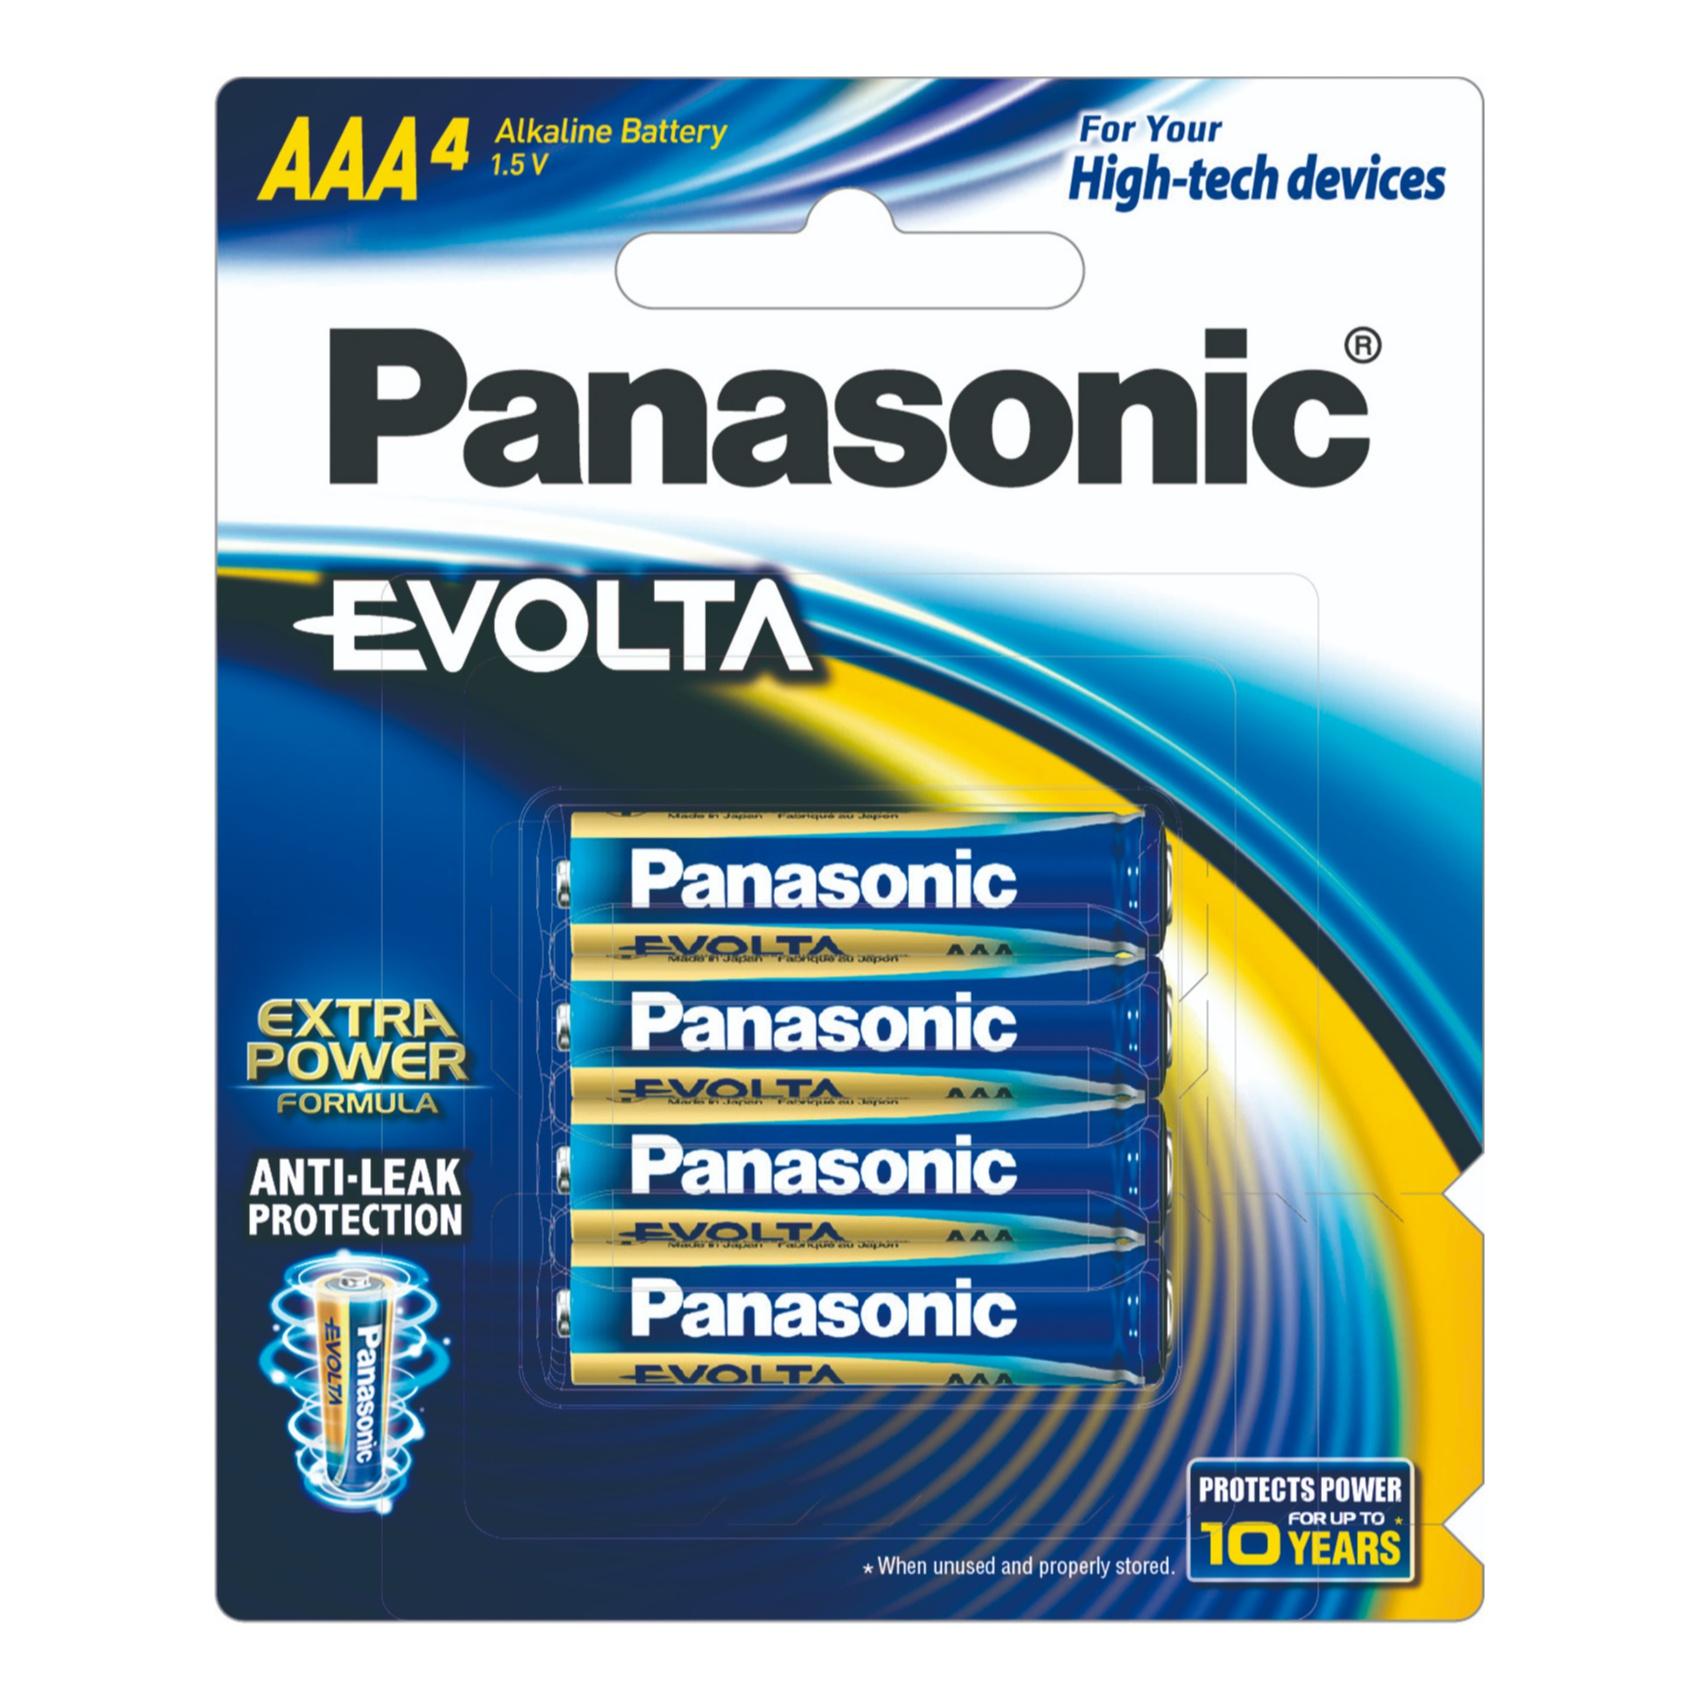 Panasonic Batteries-Lr03Eg/4B-Aaa - in Sri Lanka